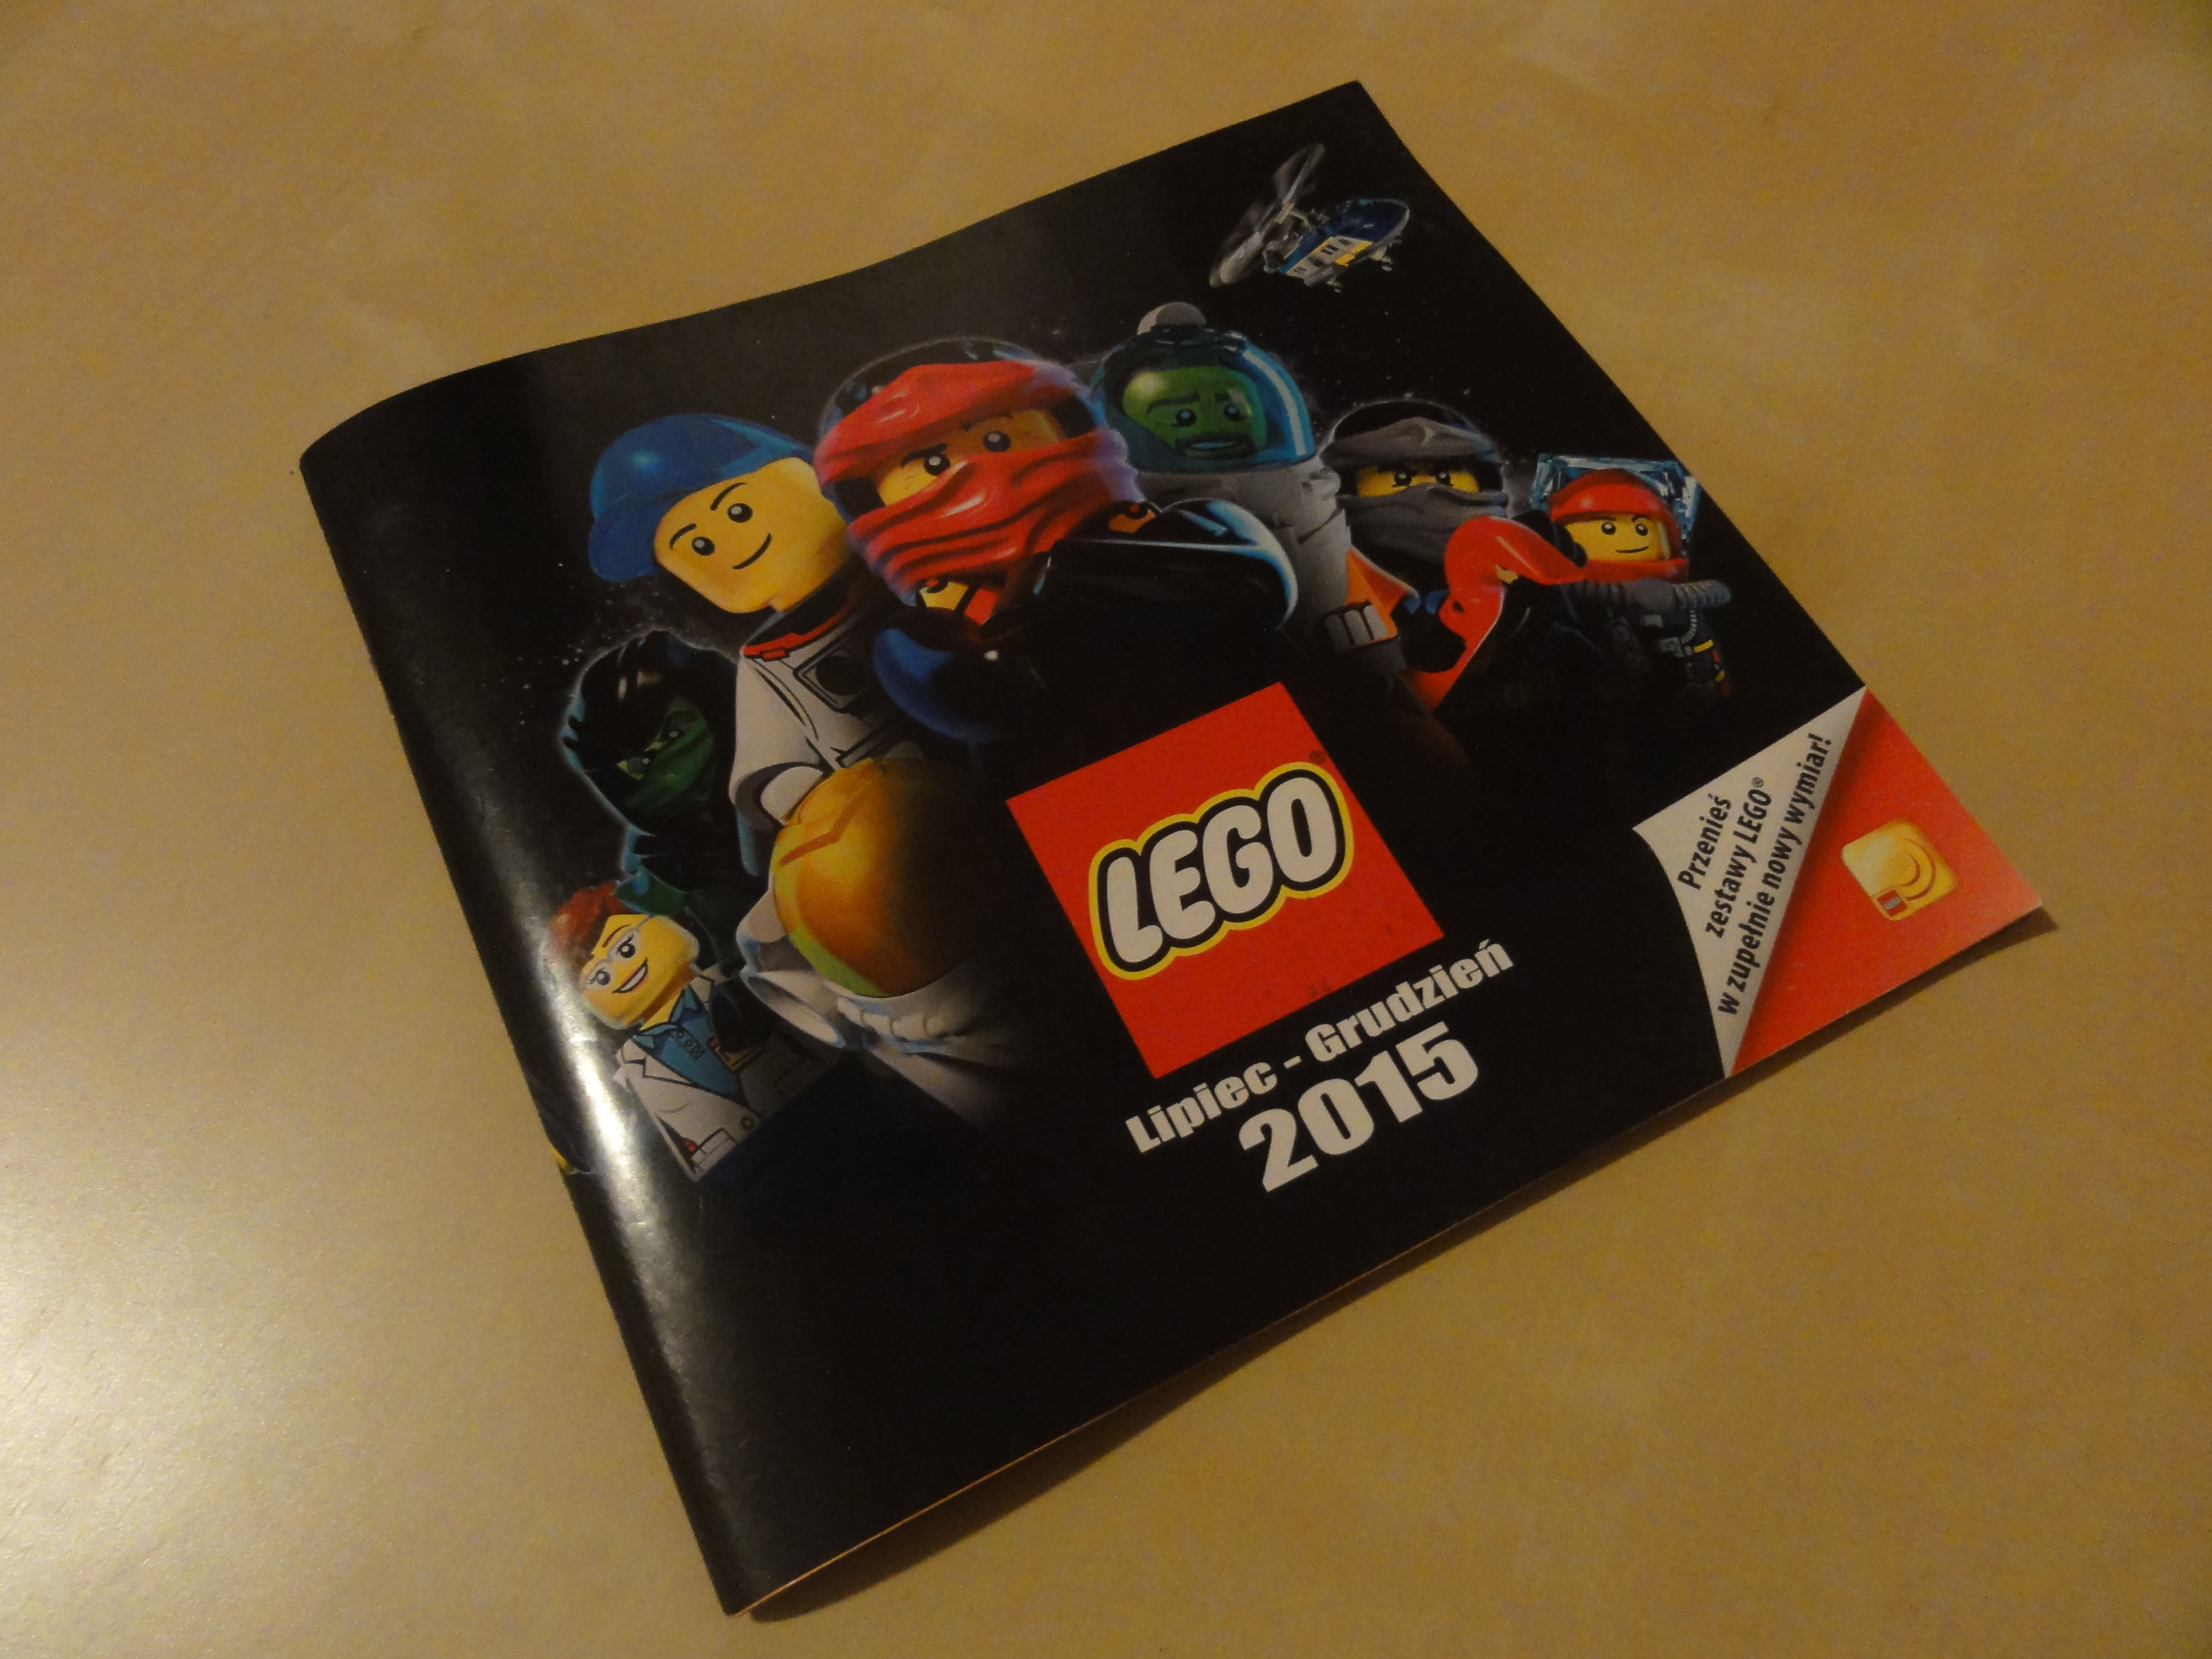 Katalog Lego Lipiec Grudzień 2015 Abteampoznan